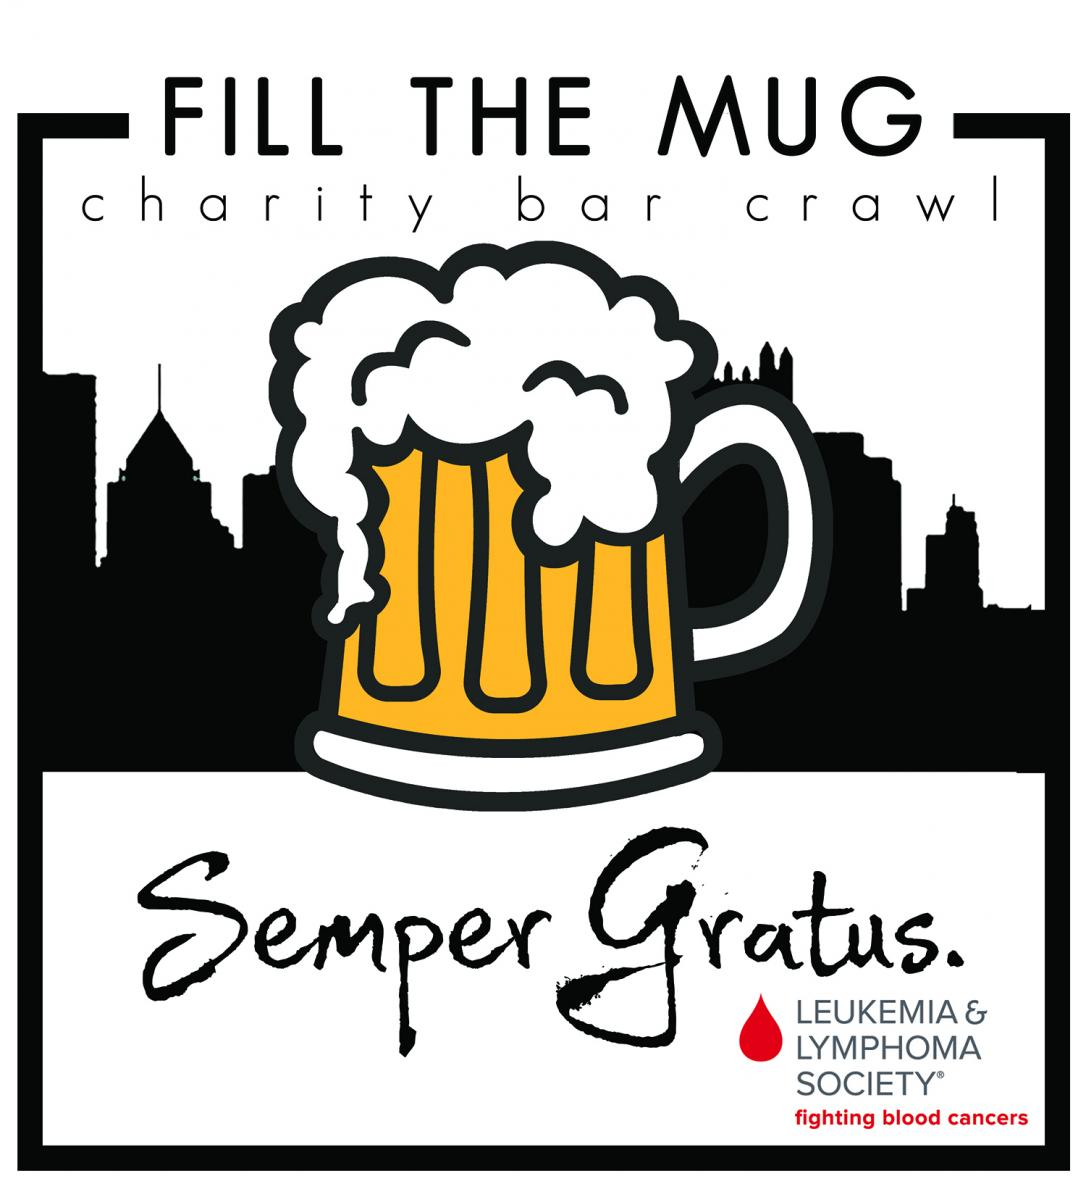 Fill the Mug Charity Bar Crawl benefitting Leukemia & Lymphoma Society